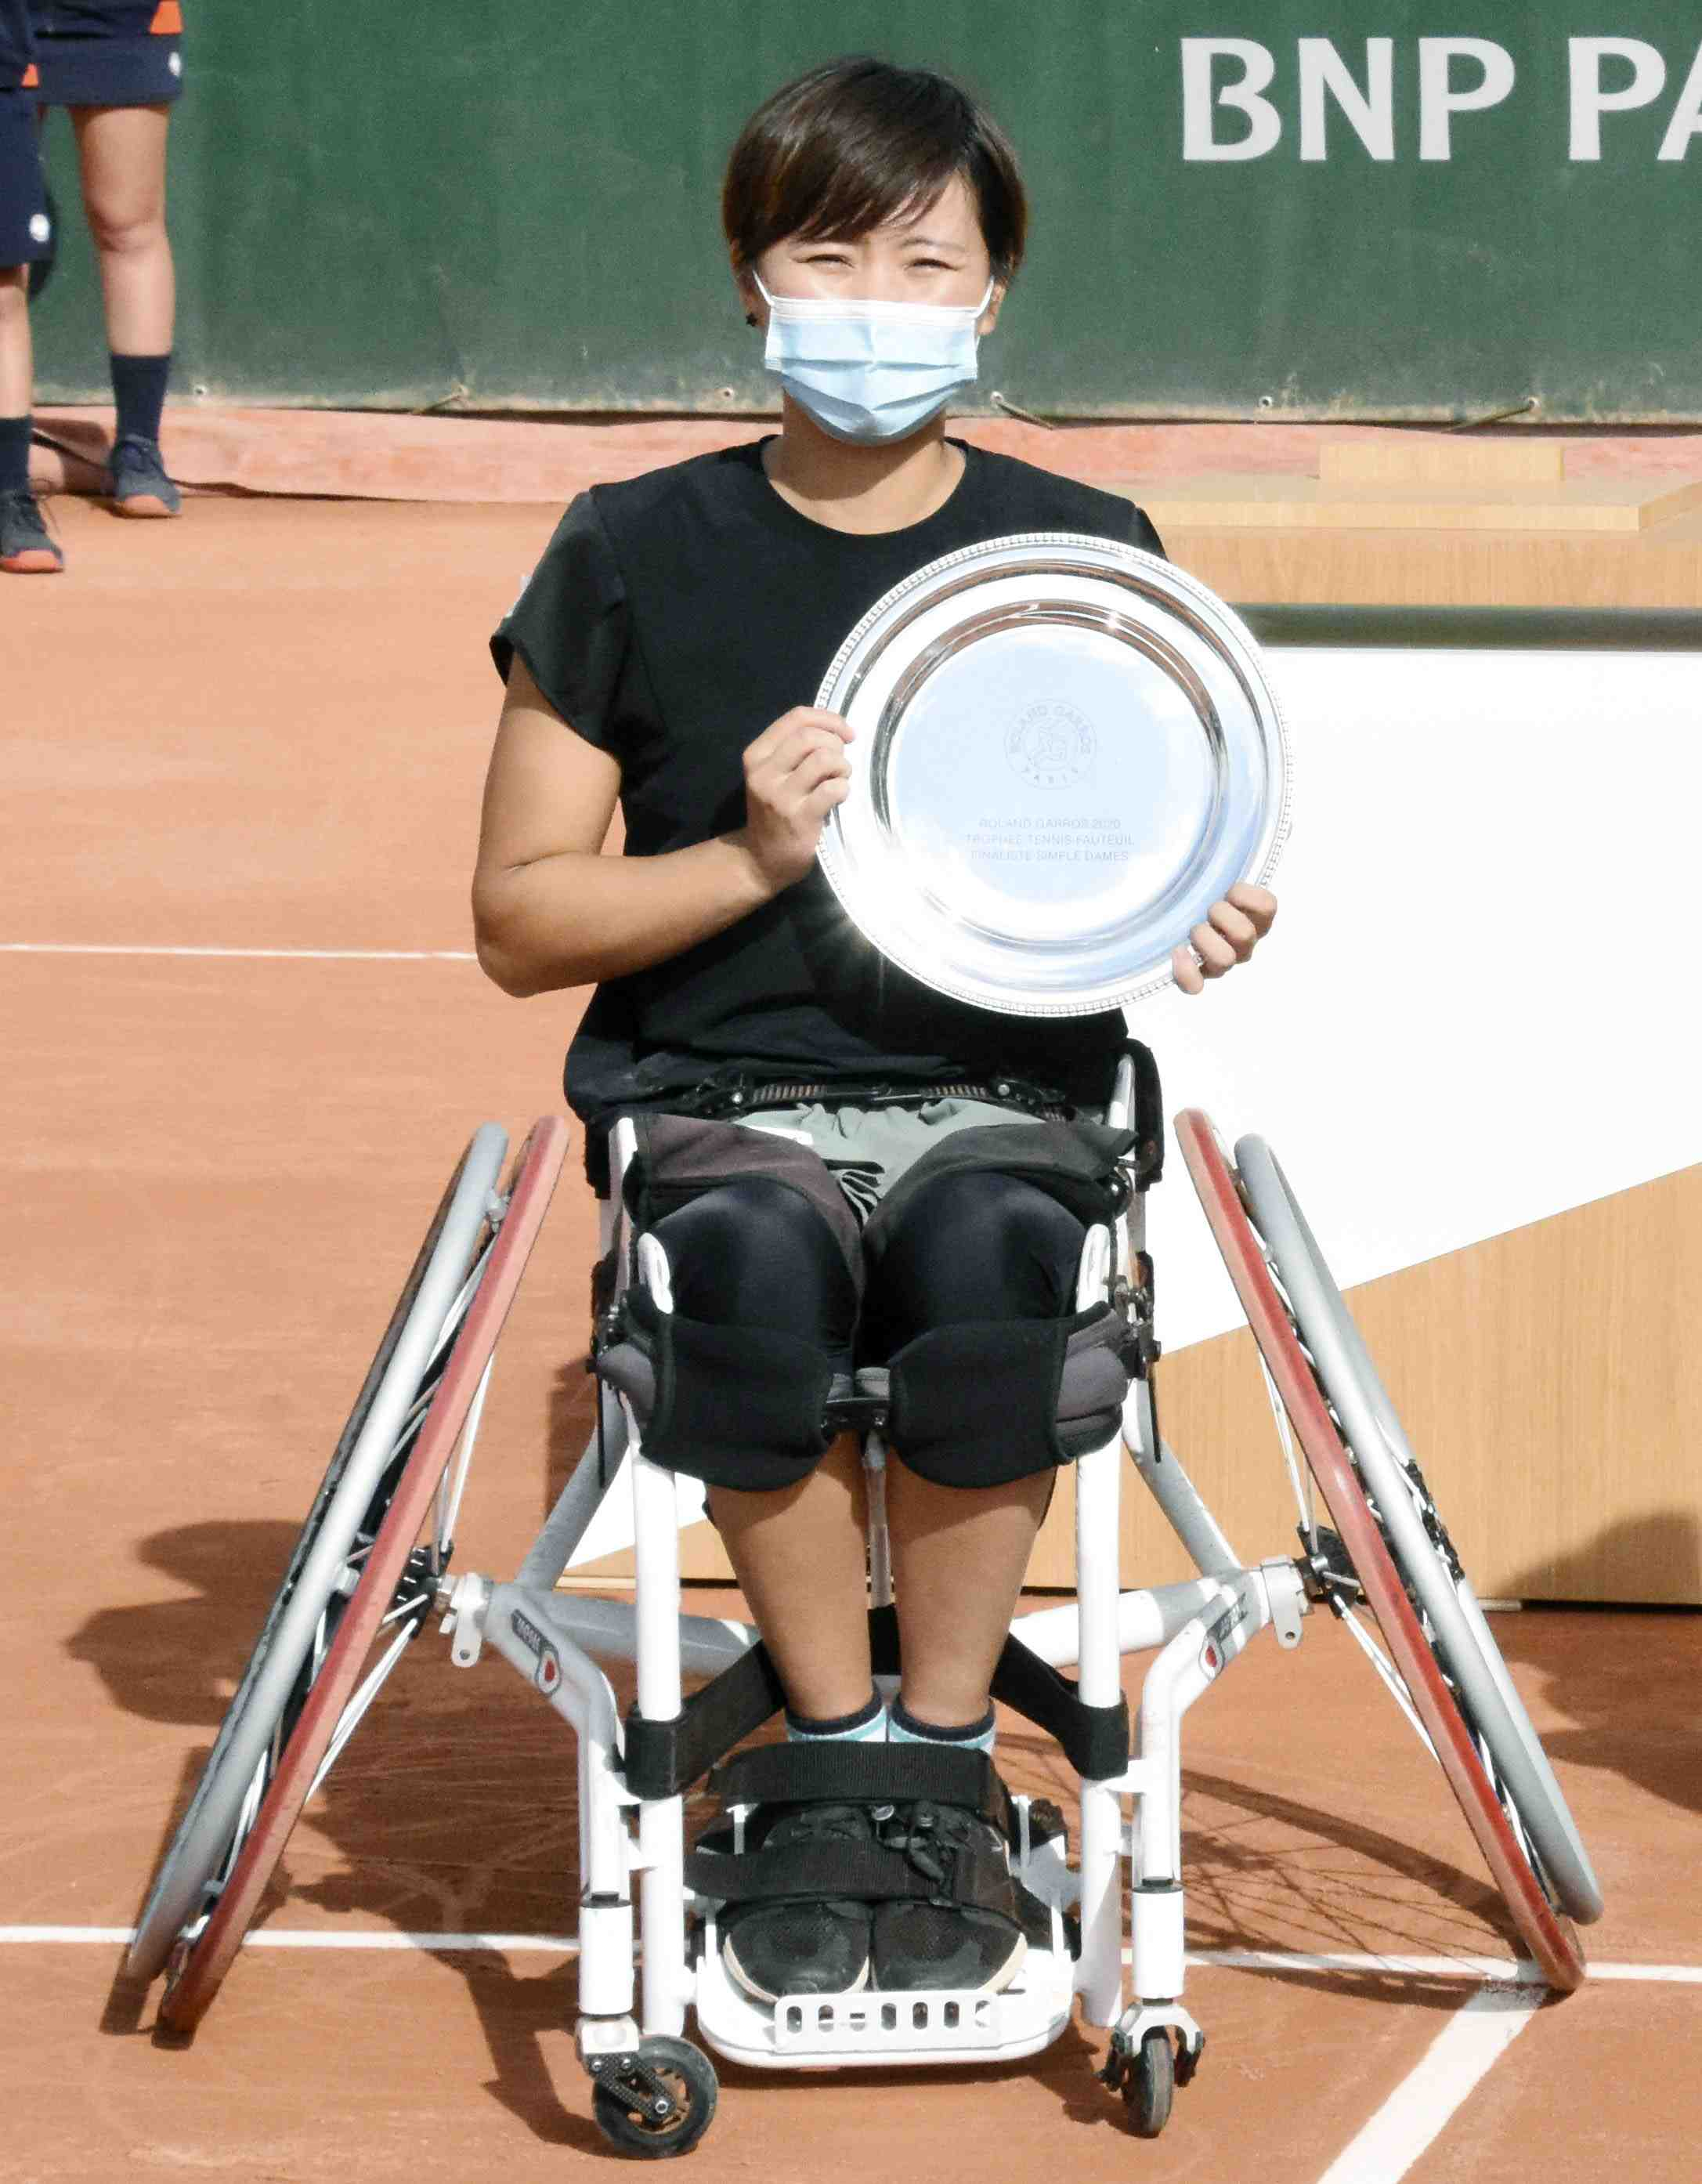 Japan's Yui Kamiji after winning the women's wheelchair final match of the French Open tennis 010